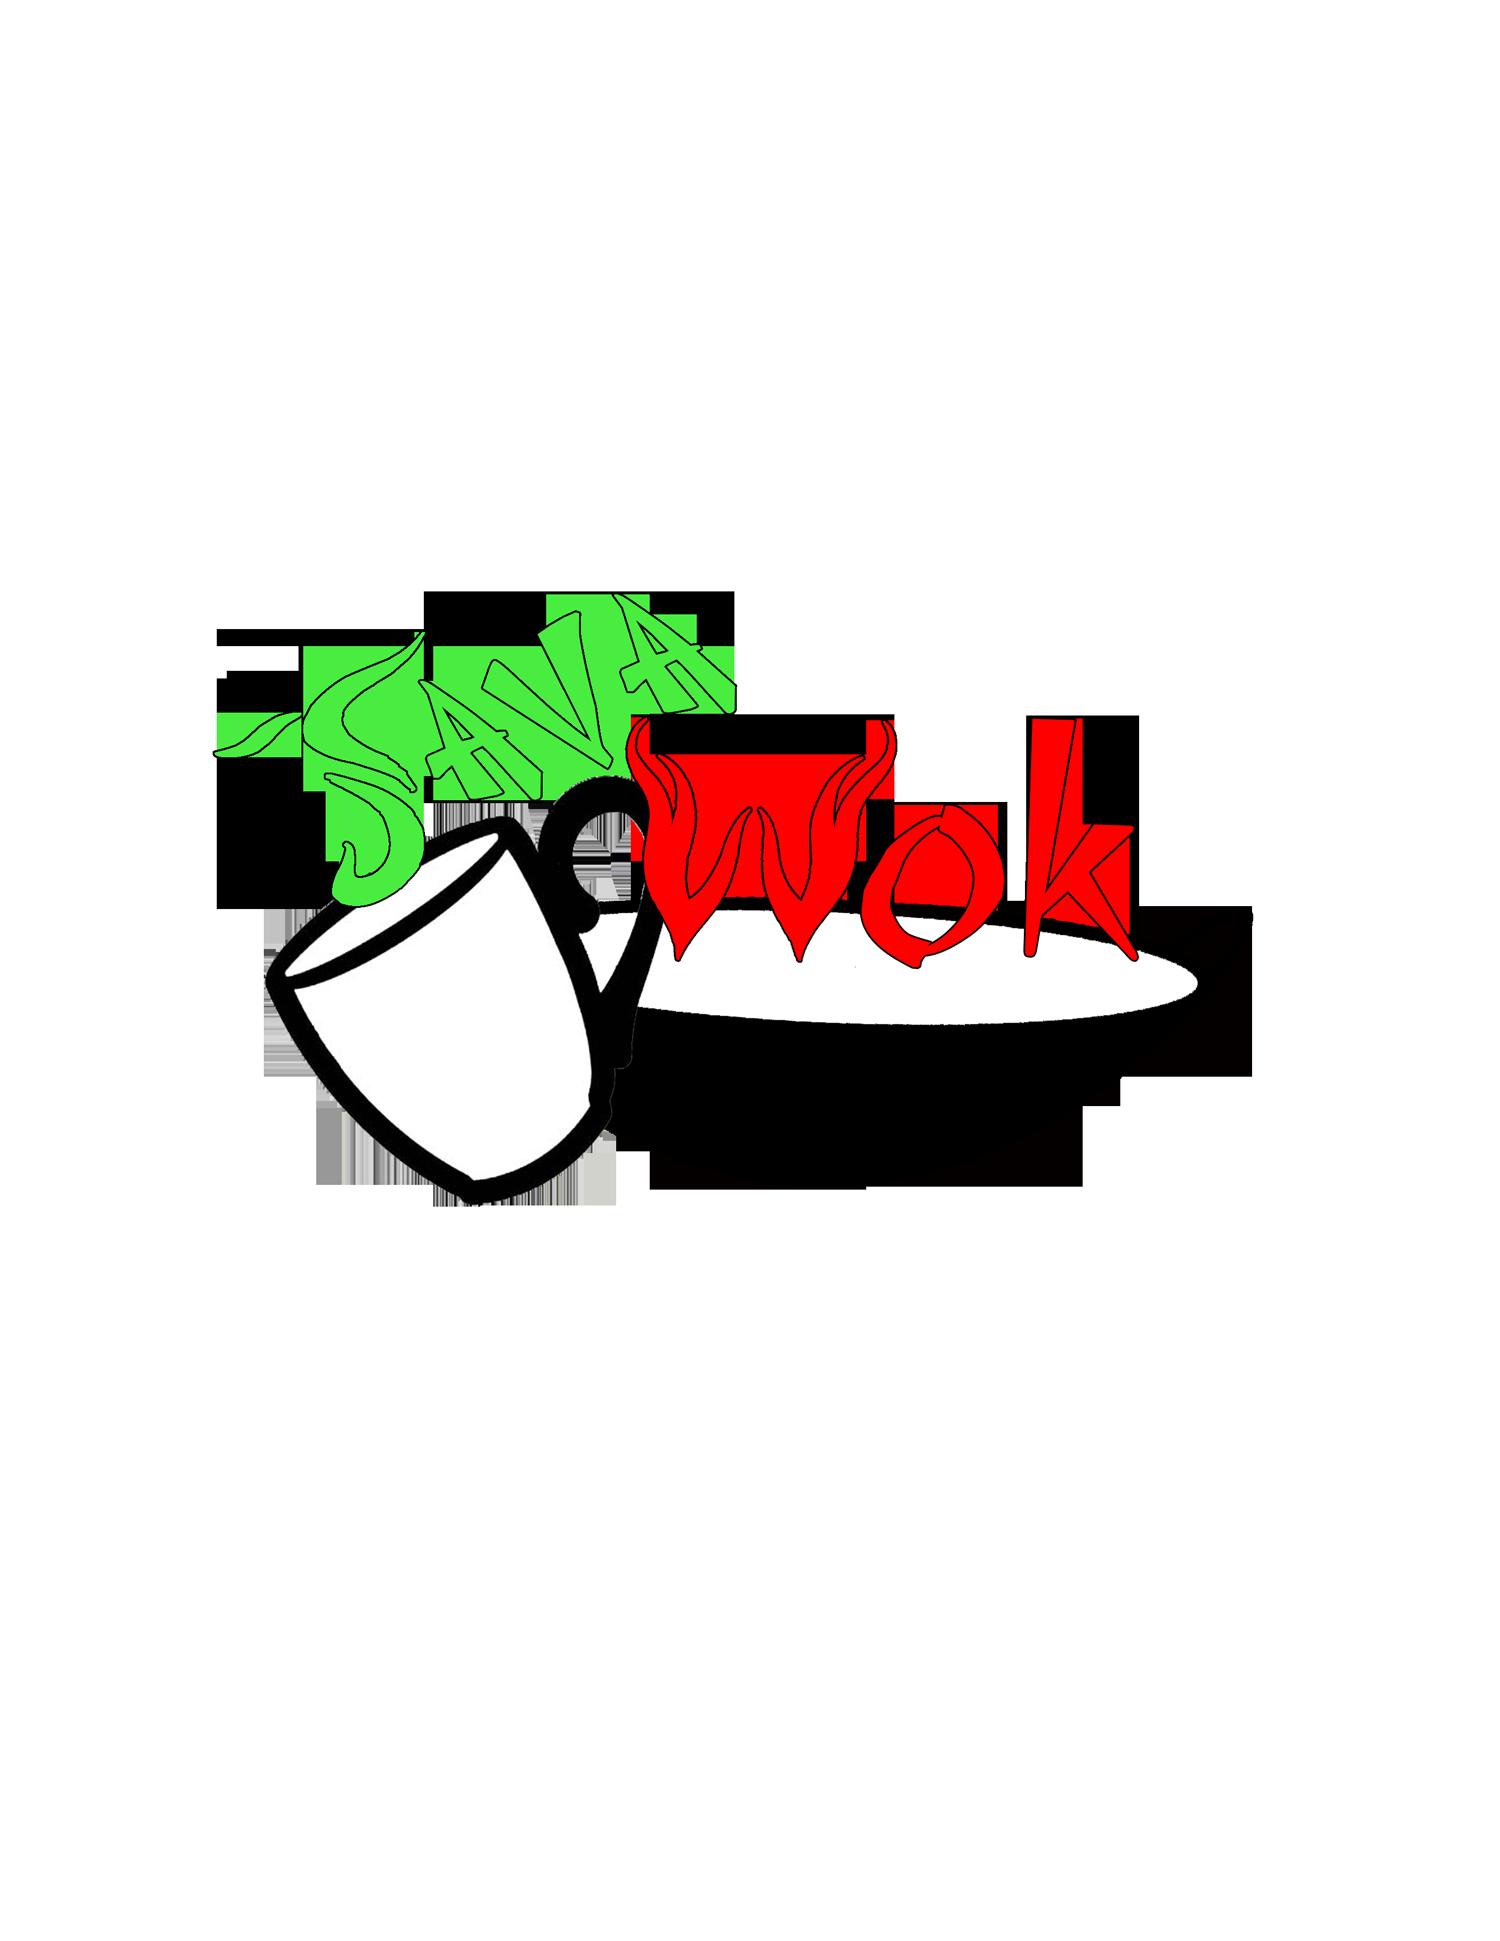 Java-Wok-Logo-FINAL-White-Background-WEB.png